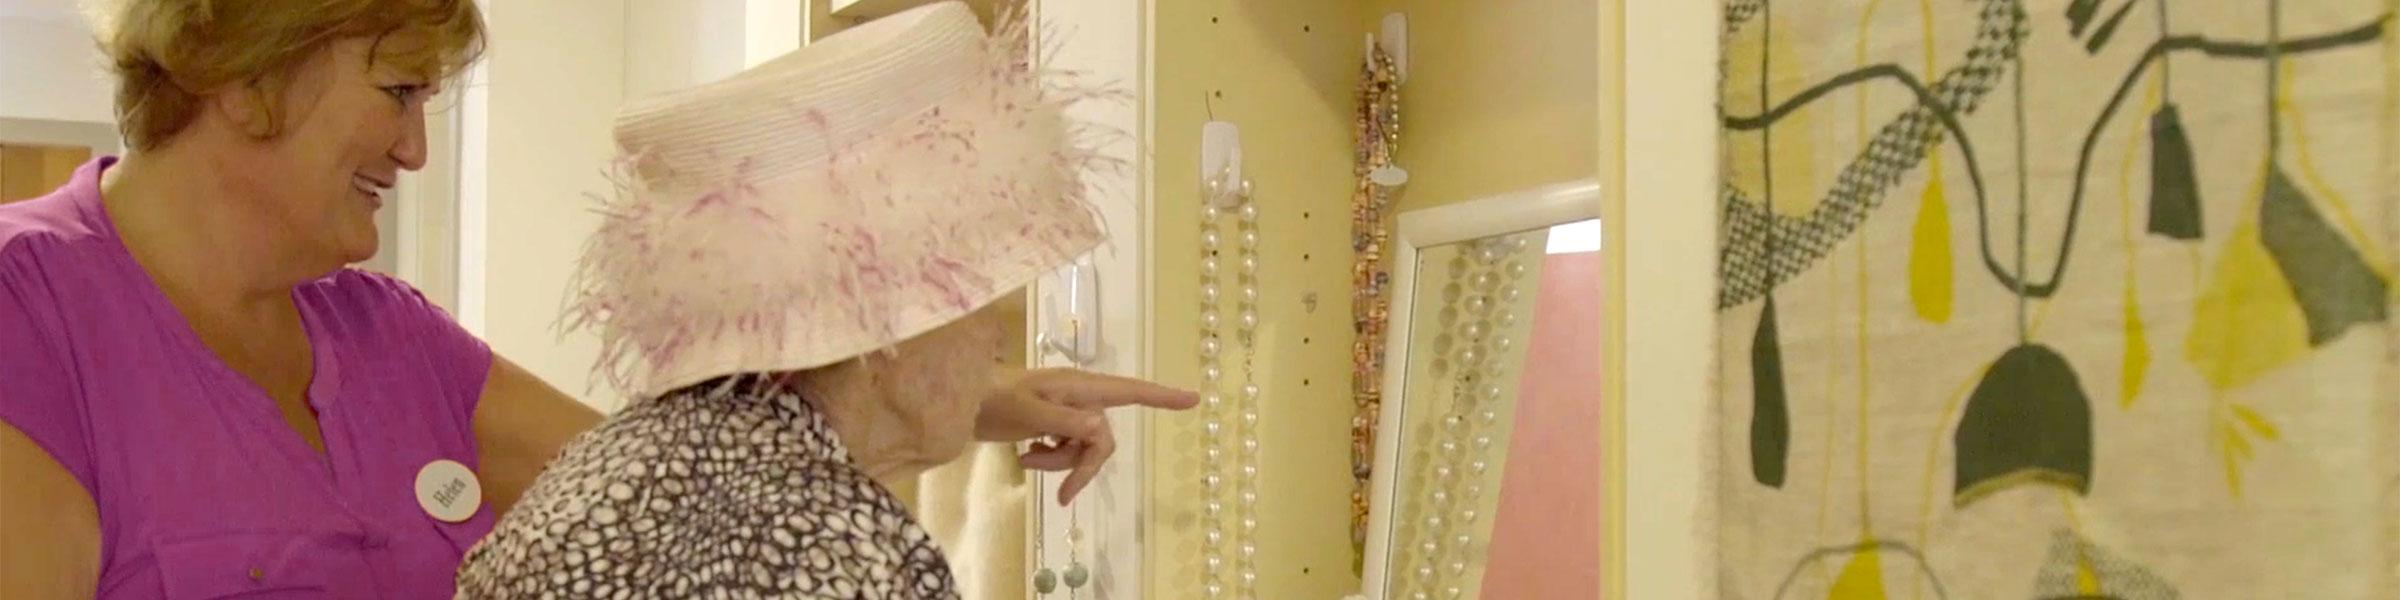 Elderly woman in Montessori environment